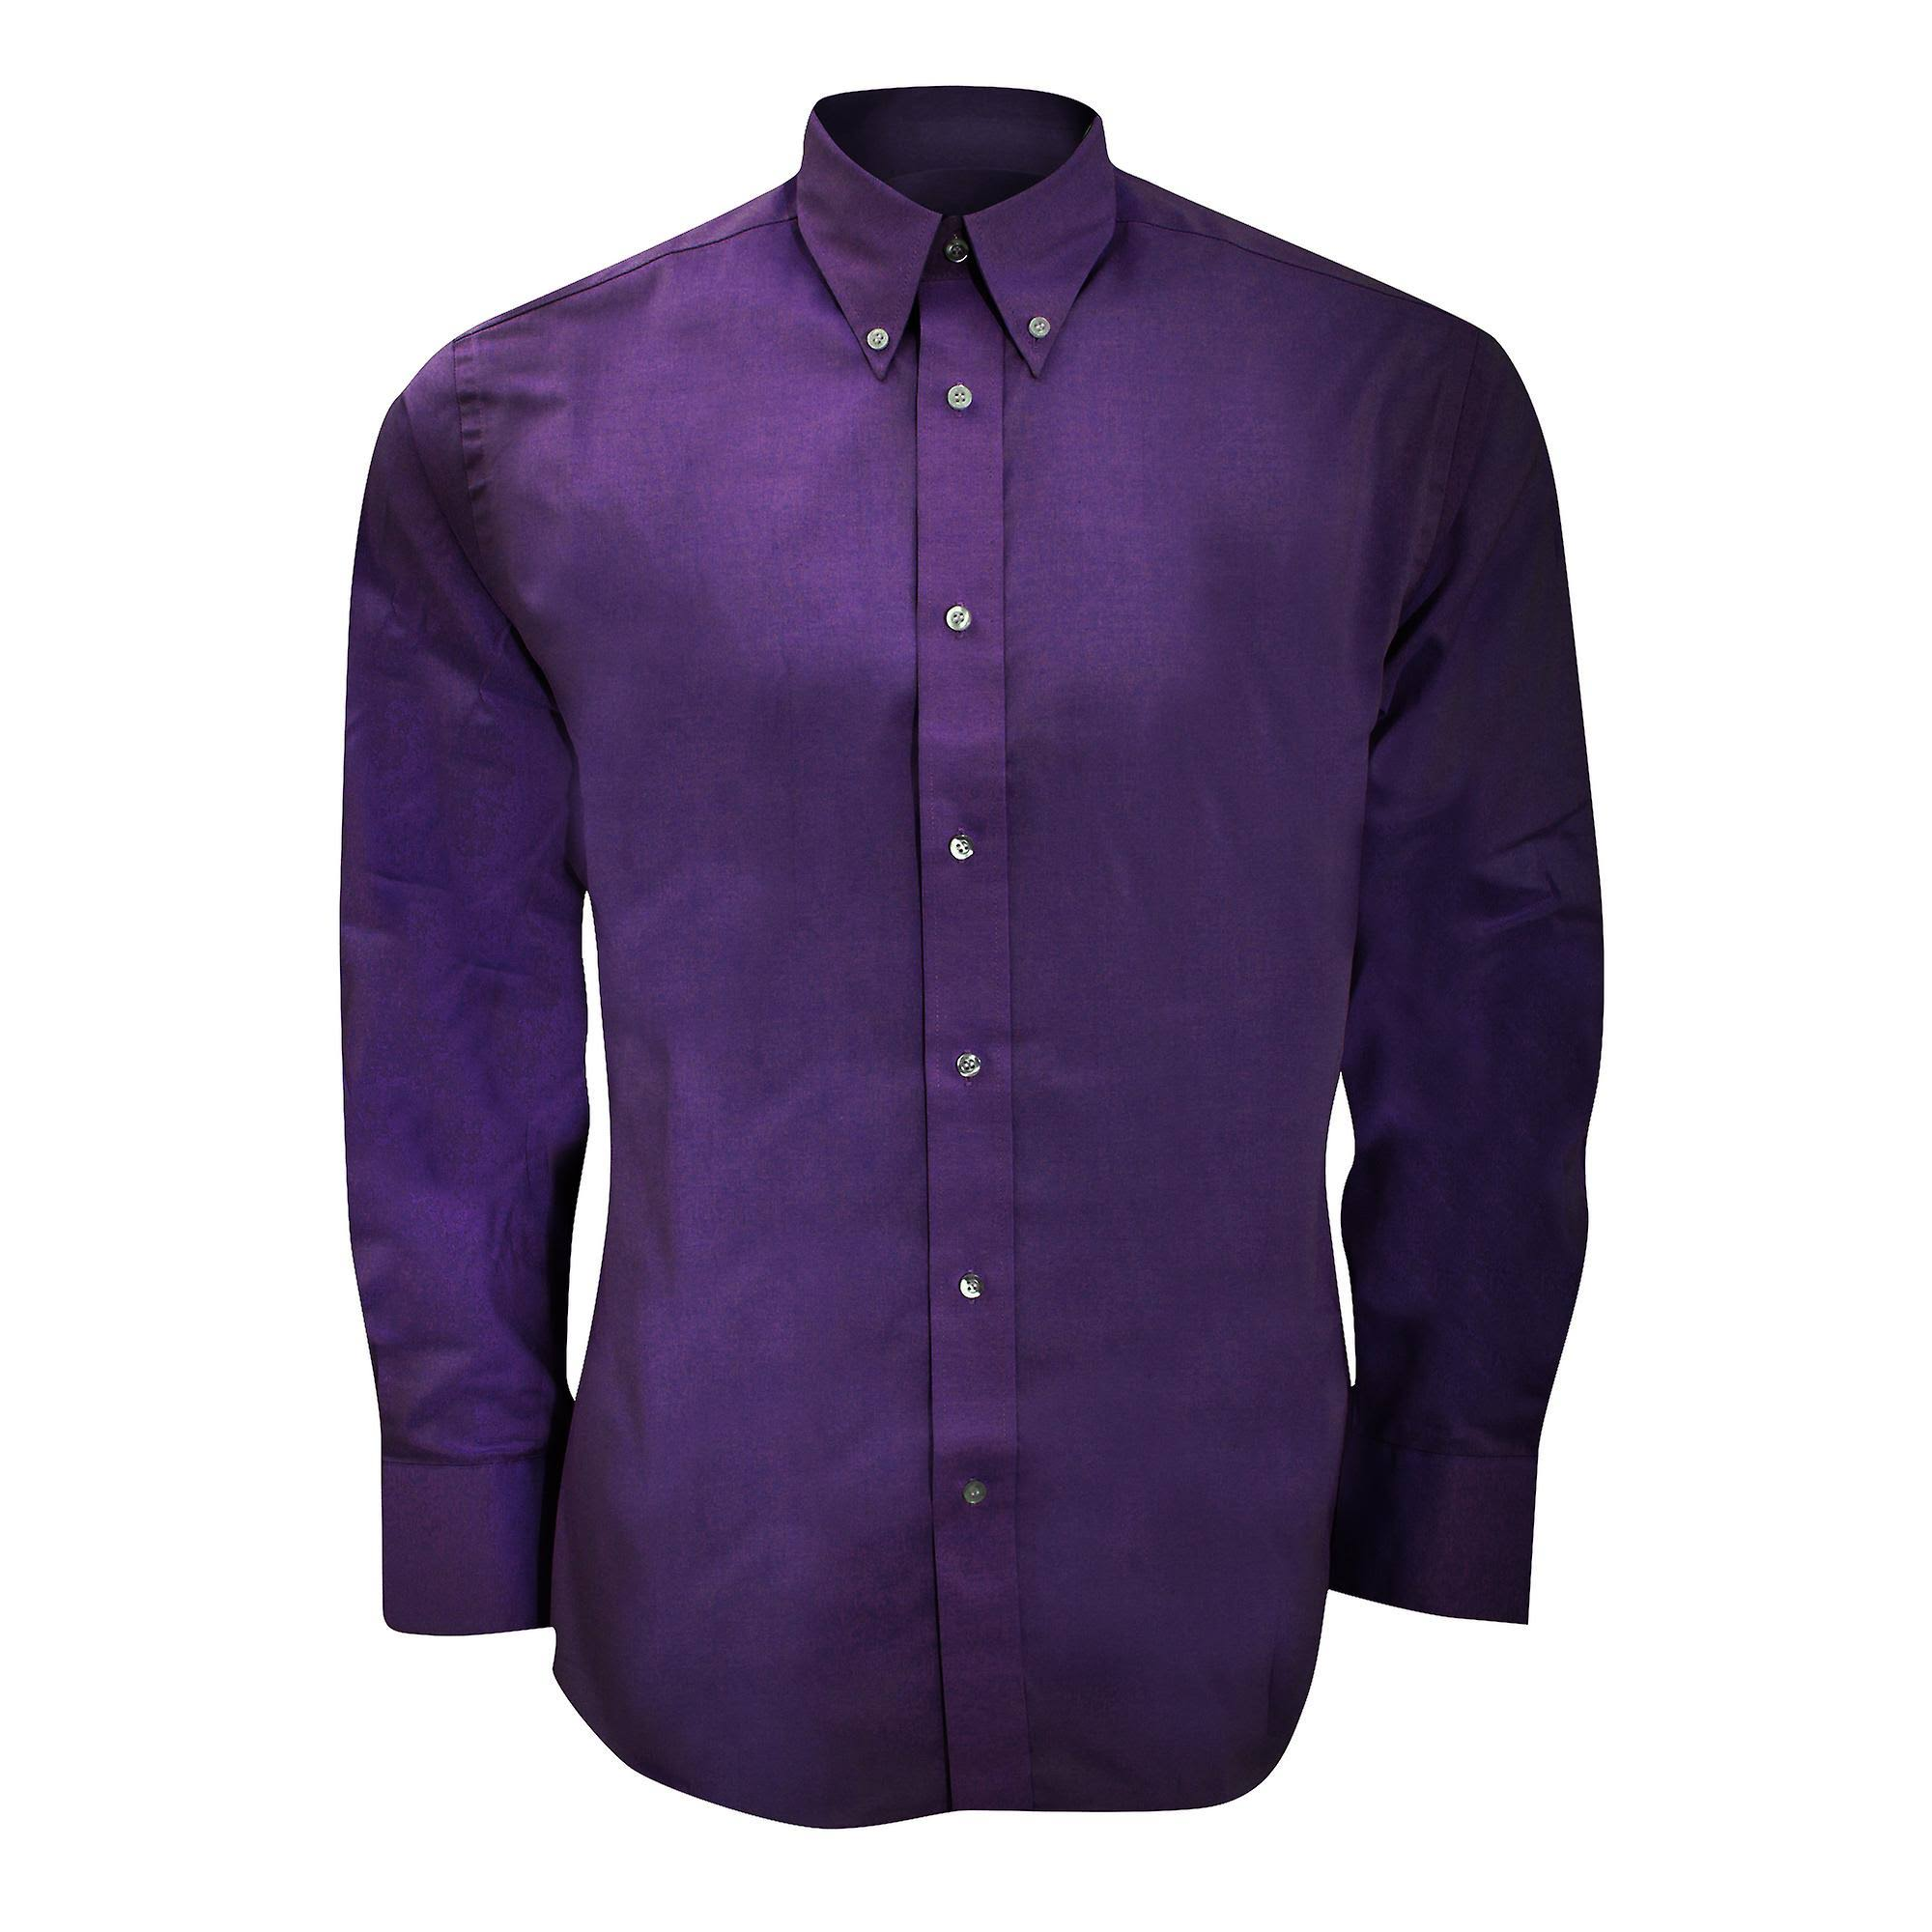 De Para Premium Camisa Dark Purple Oxford Manga Hombre Kit Tailored Fit Larga Kustom twCqa5q